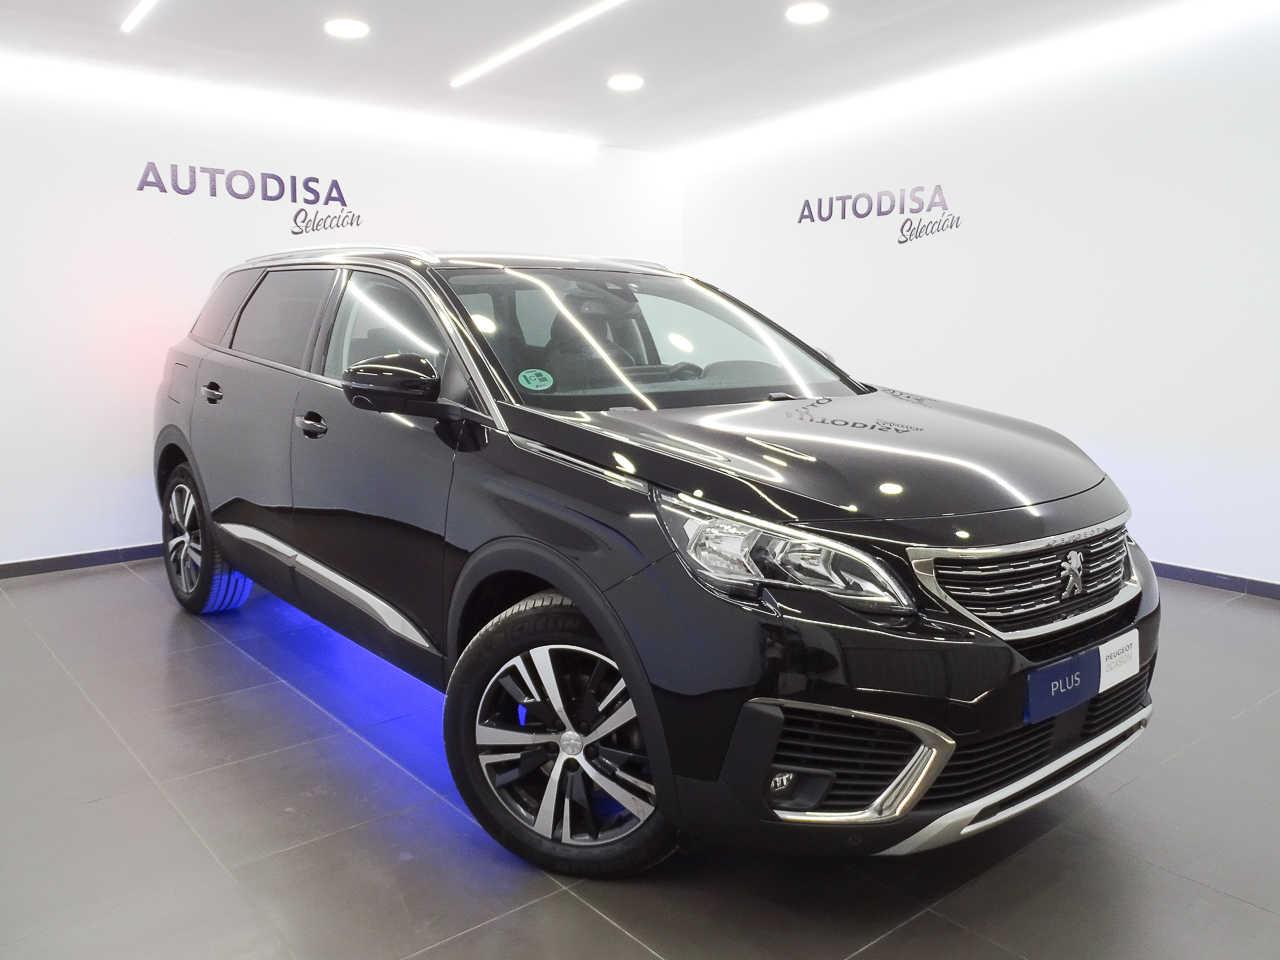 Peugeot 5008 ALLURE 1.5L BlueHDi 96kW (130CV) S&S